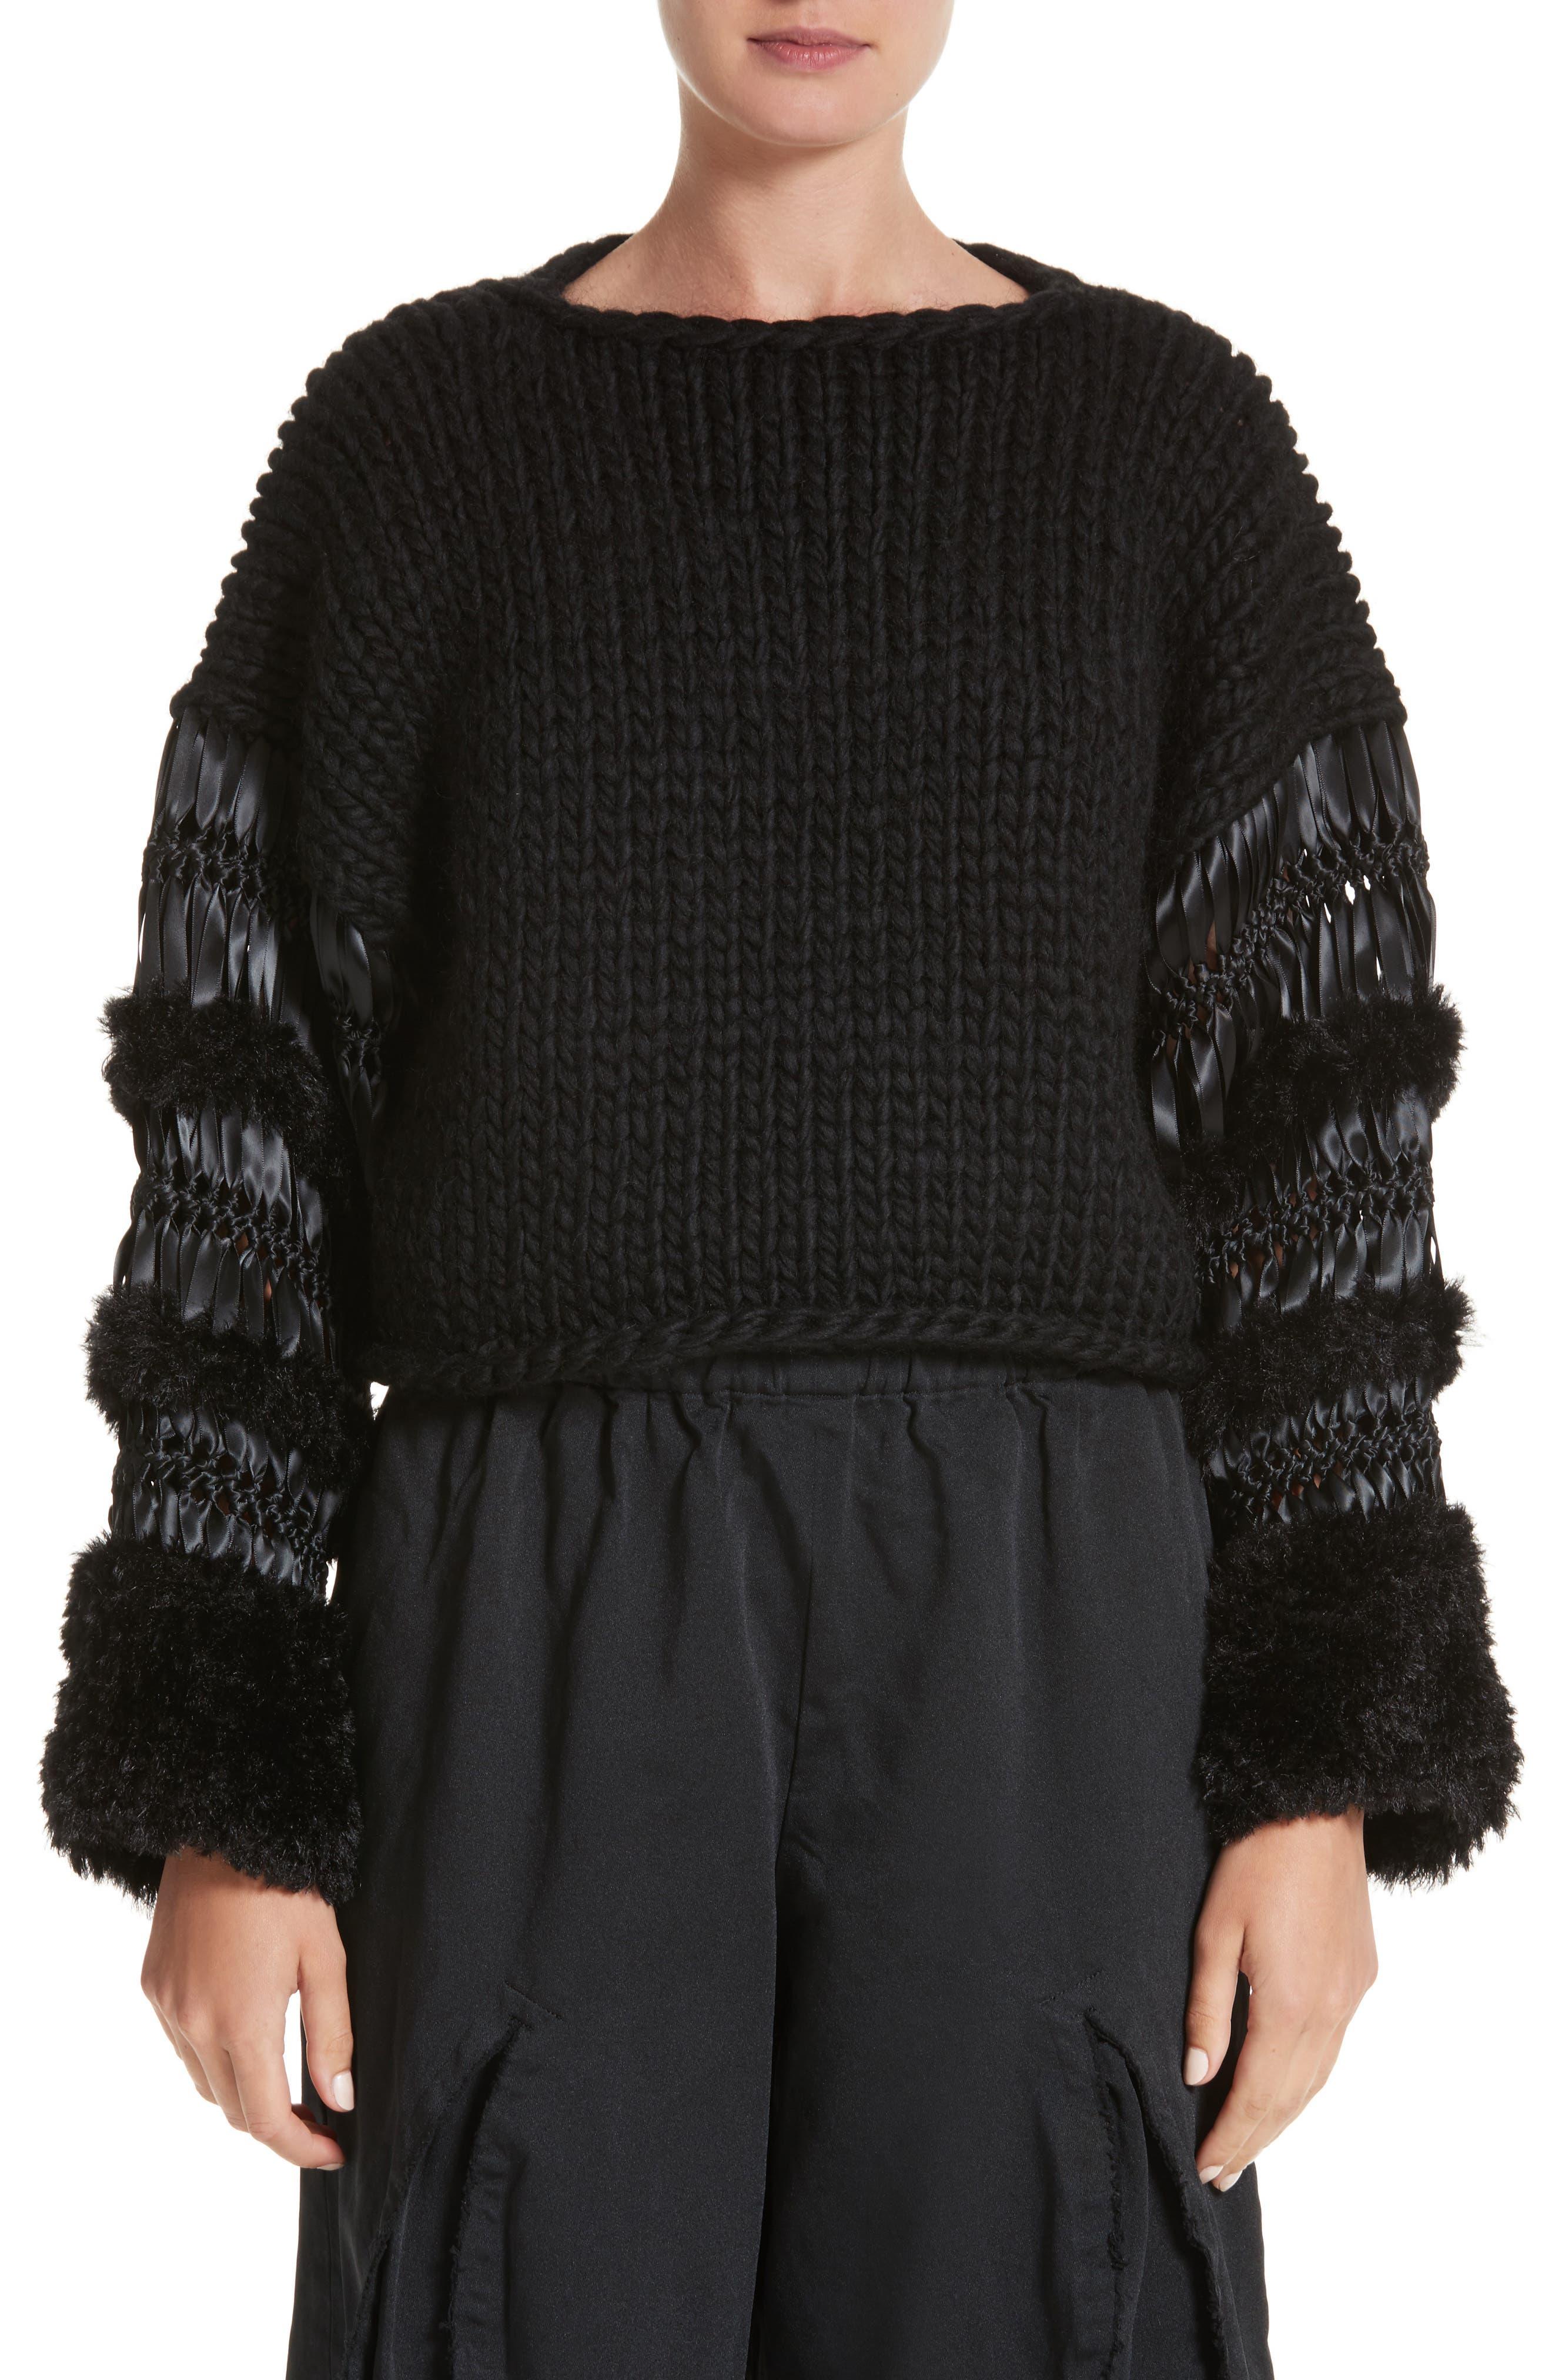 noir kei ninomiya Mixed Media Sweater